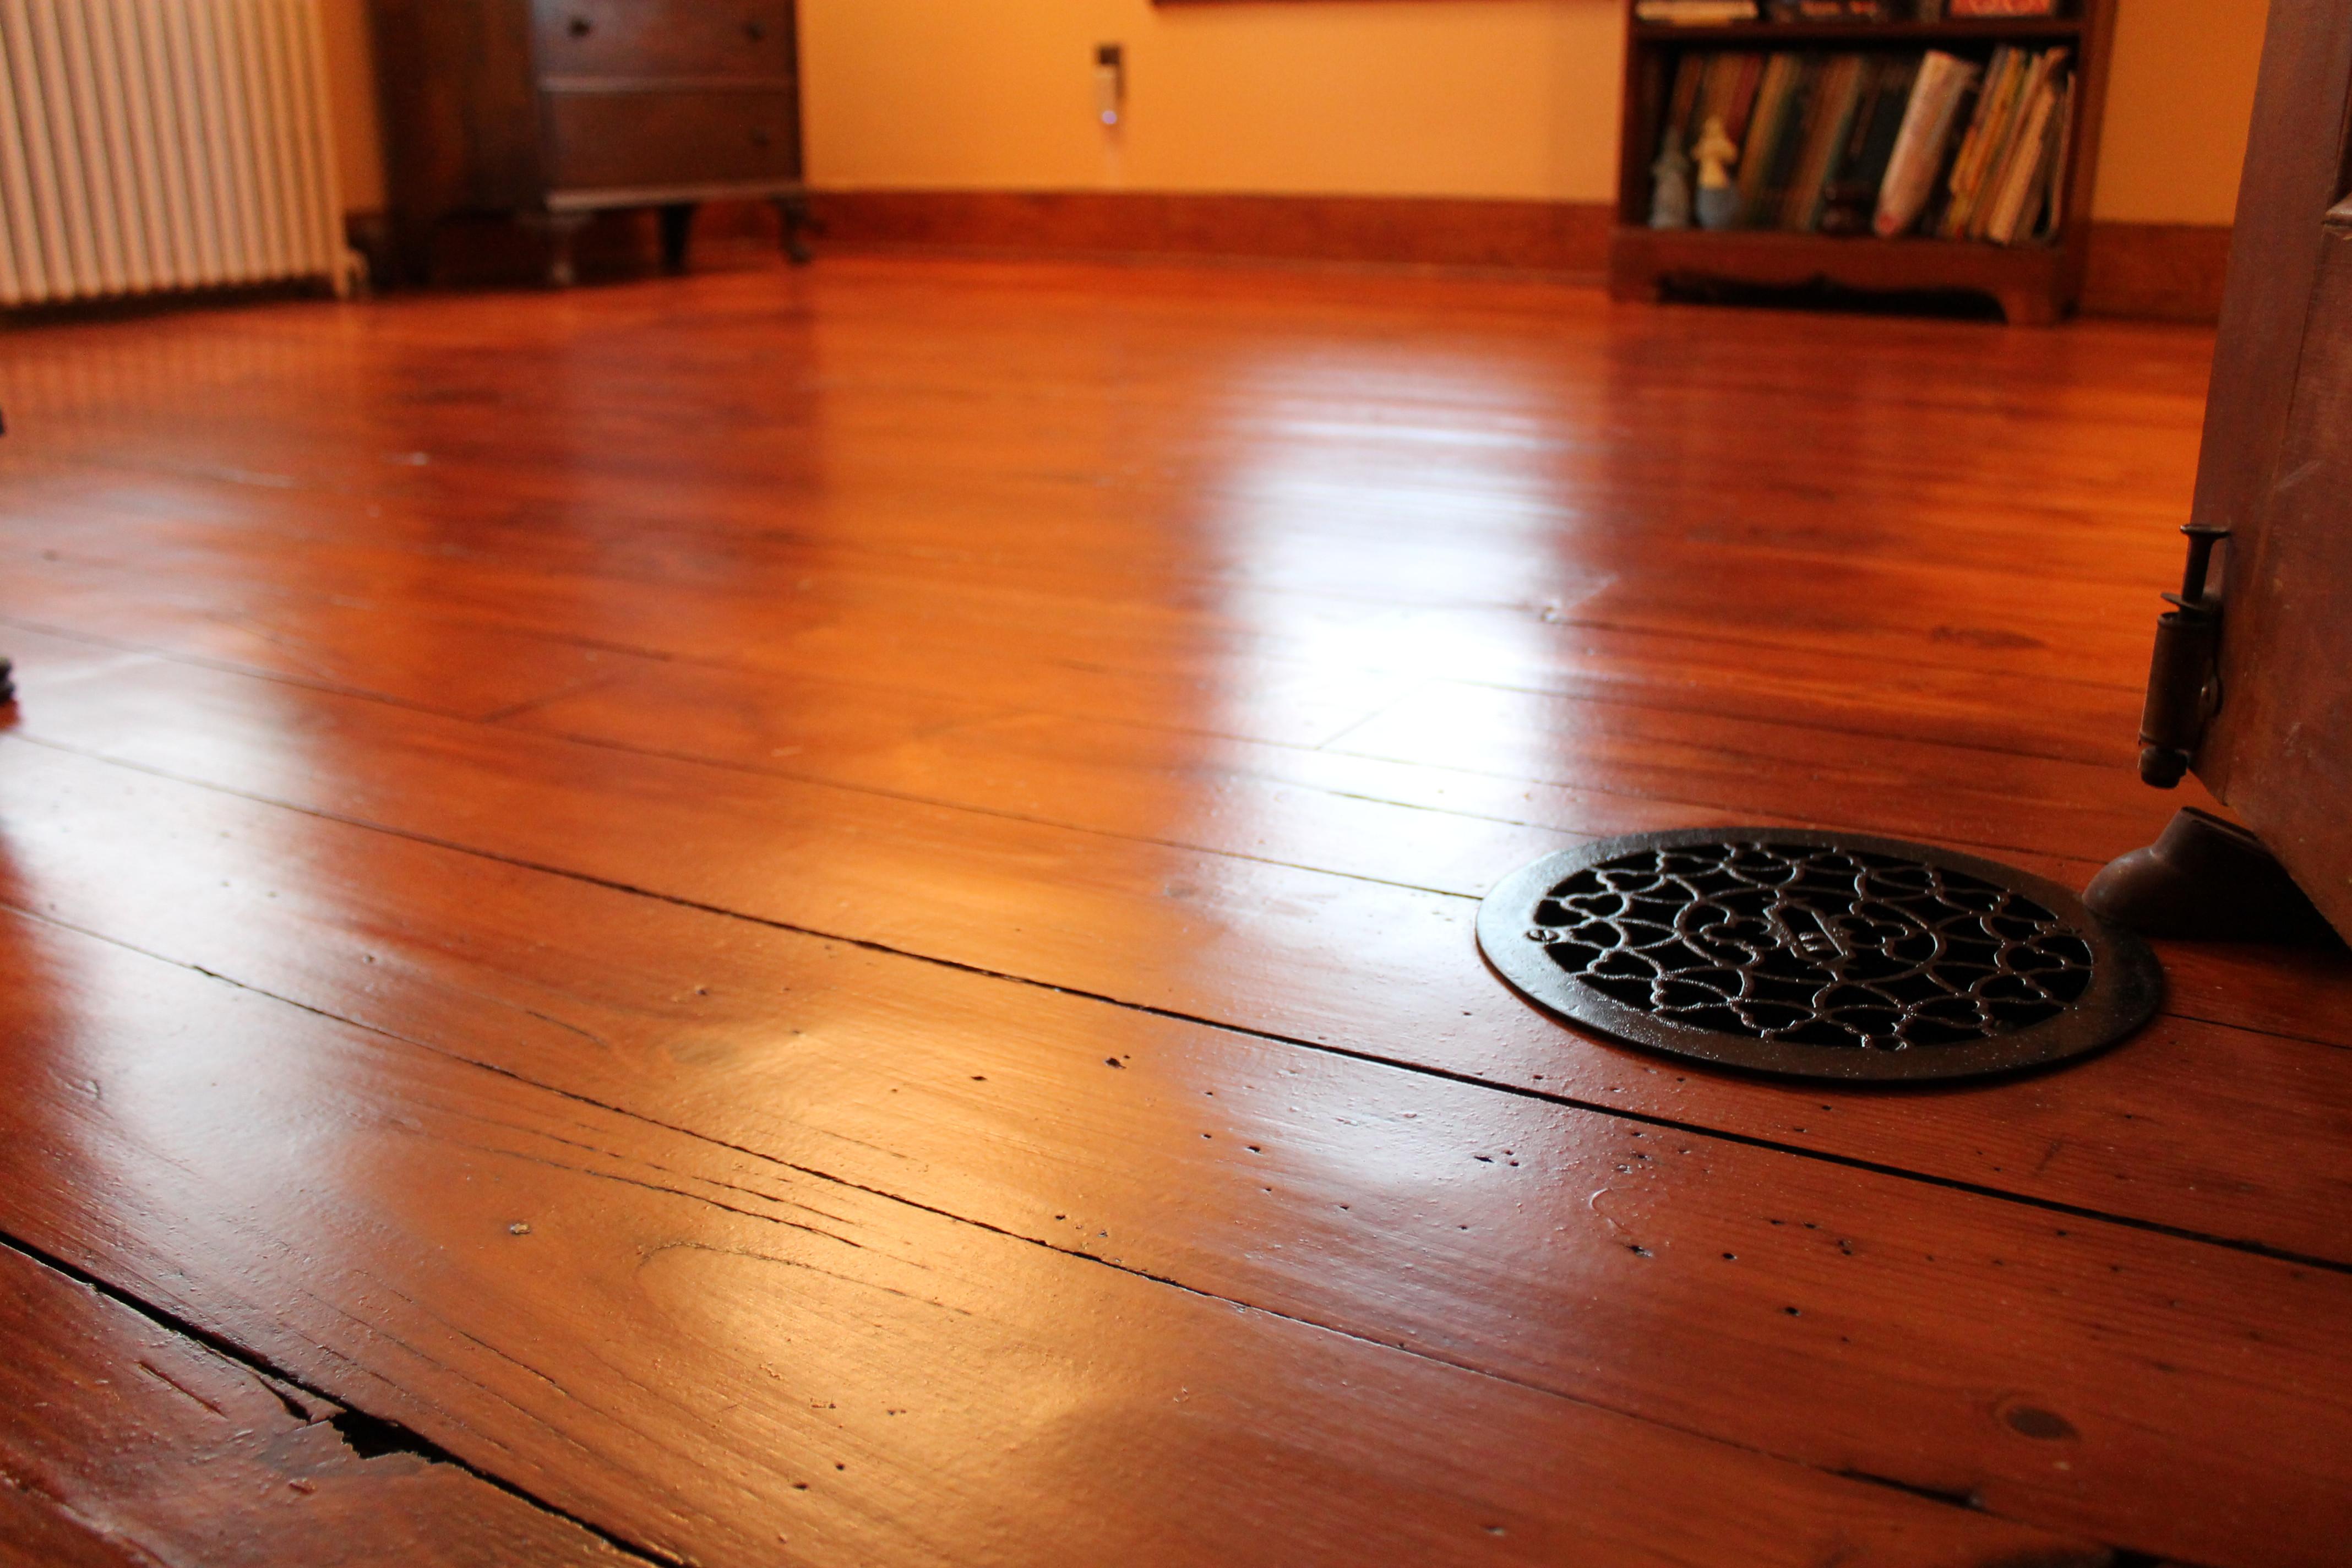 restain hardwood floors without sanding of floor refinishing company hardwood floors service by cris floor throughout floor refinishing company hardwood flooring gallery monk s home improvements